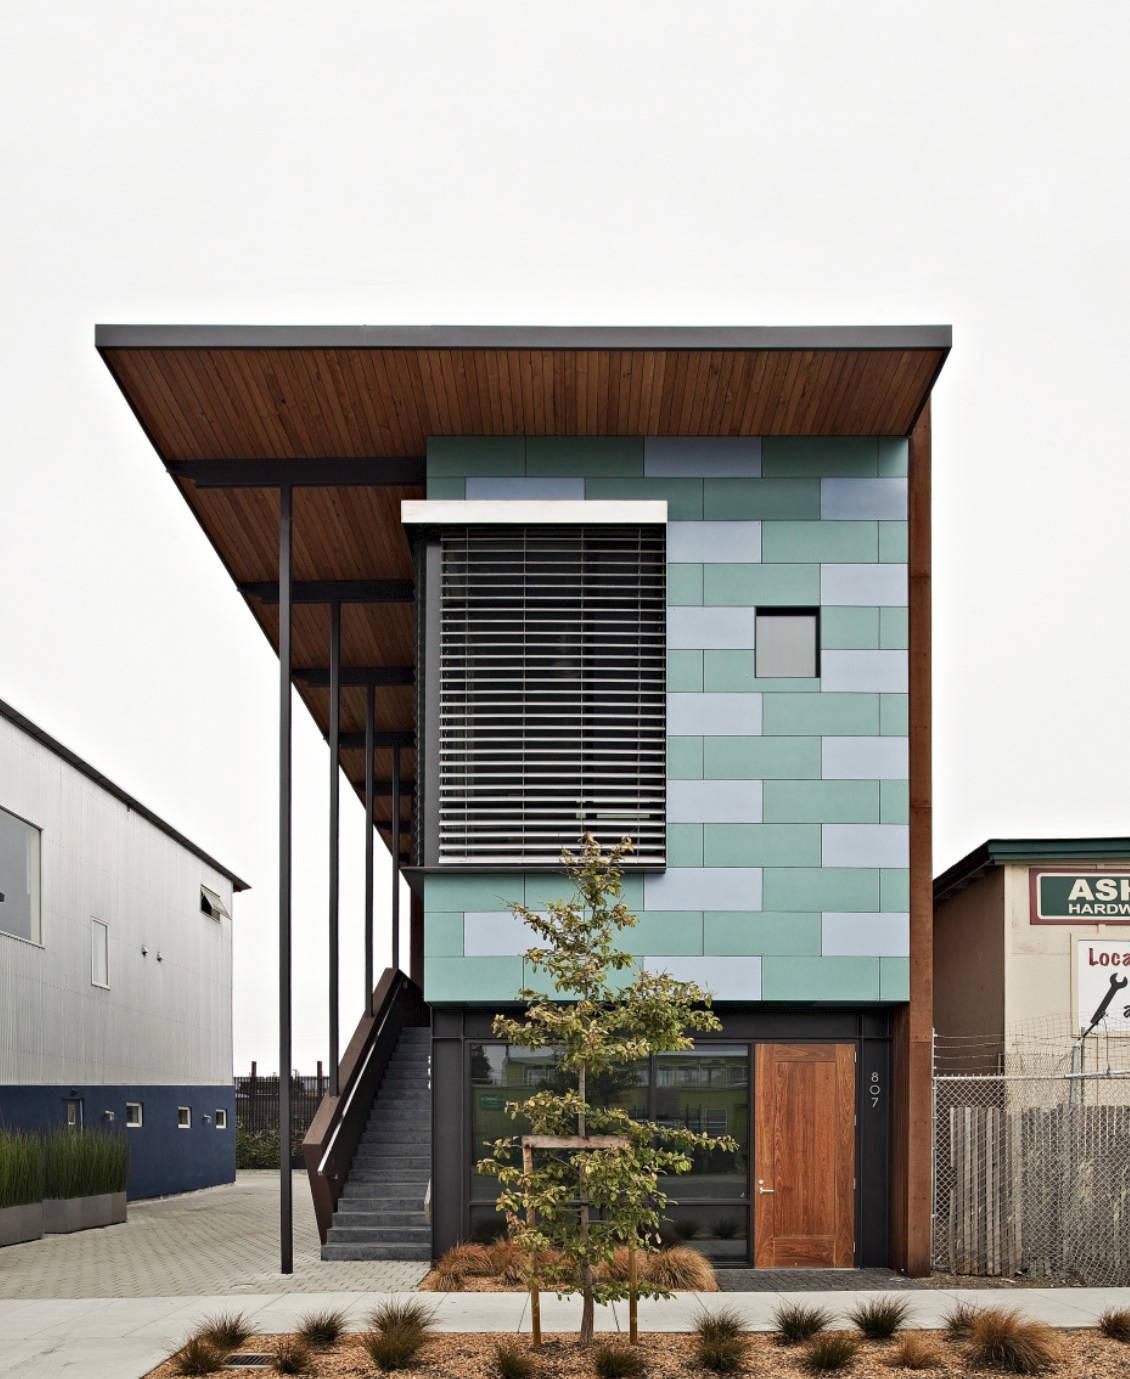 Folger Offices / WA design, © WA design